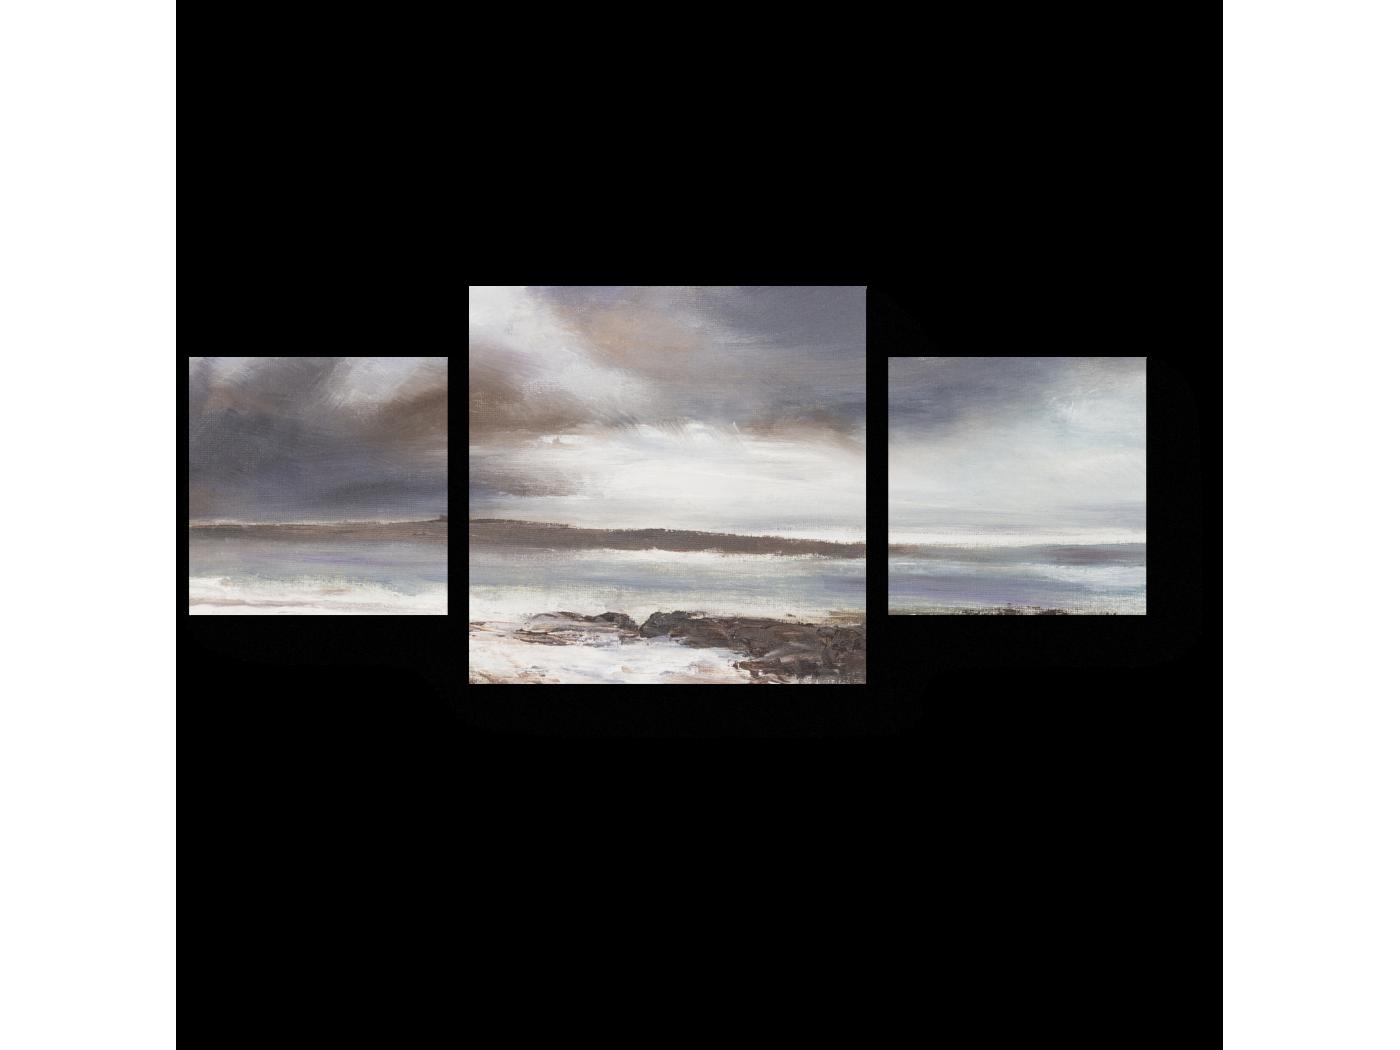 Модульная картина Морской пейзаж Бурного моря (70x30) фото